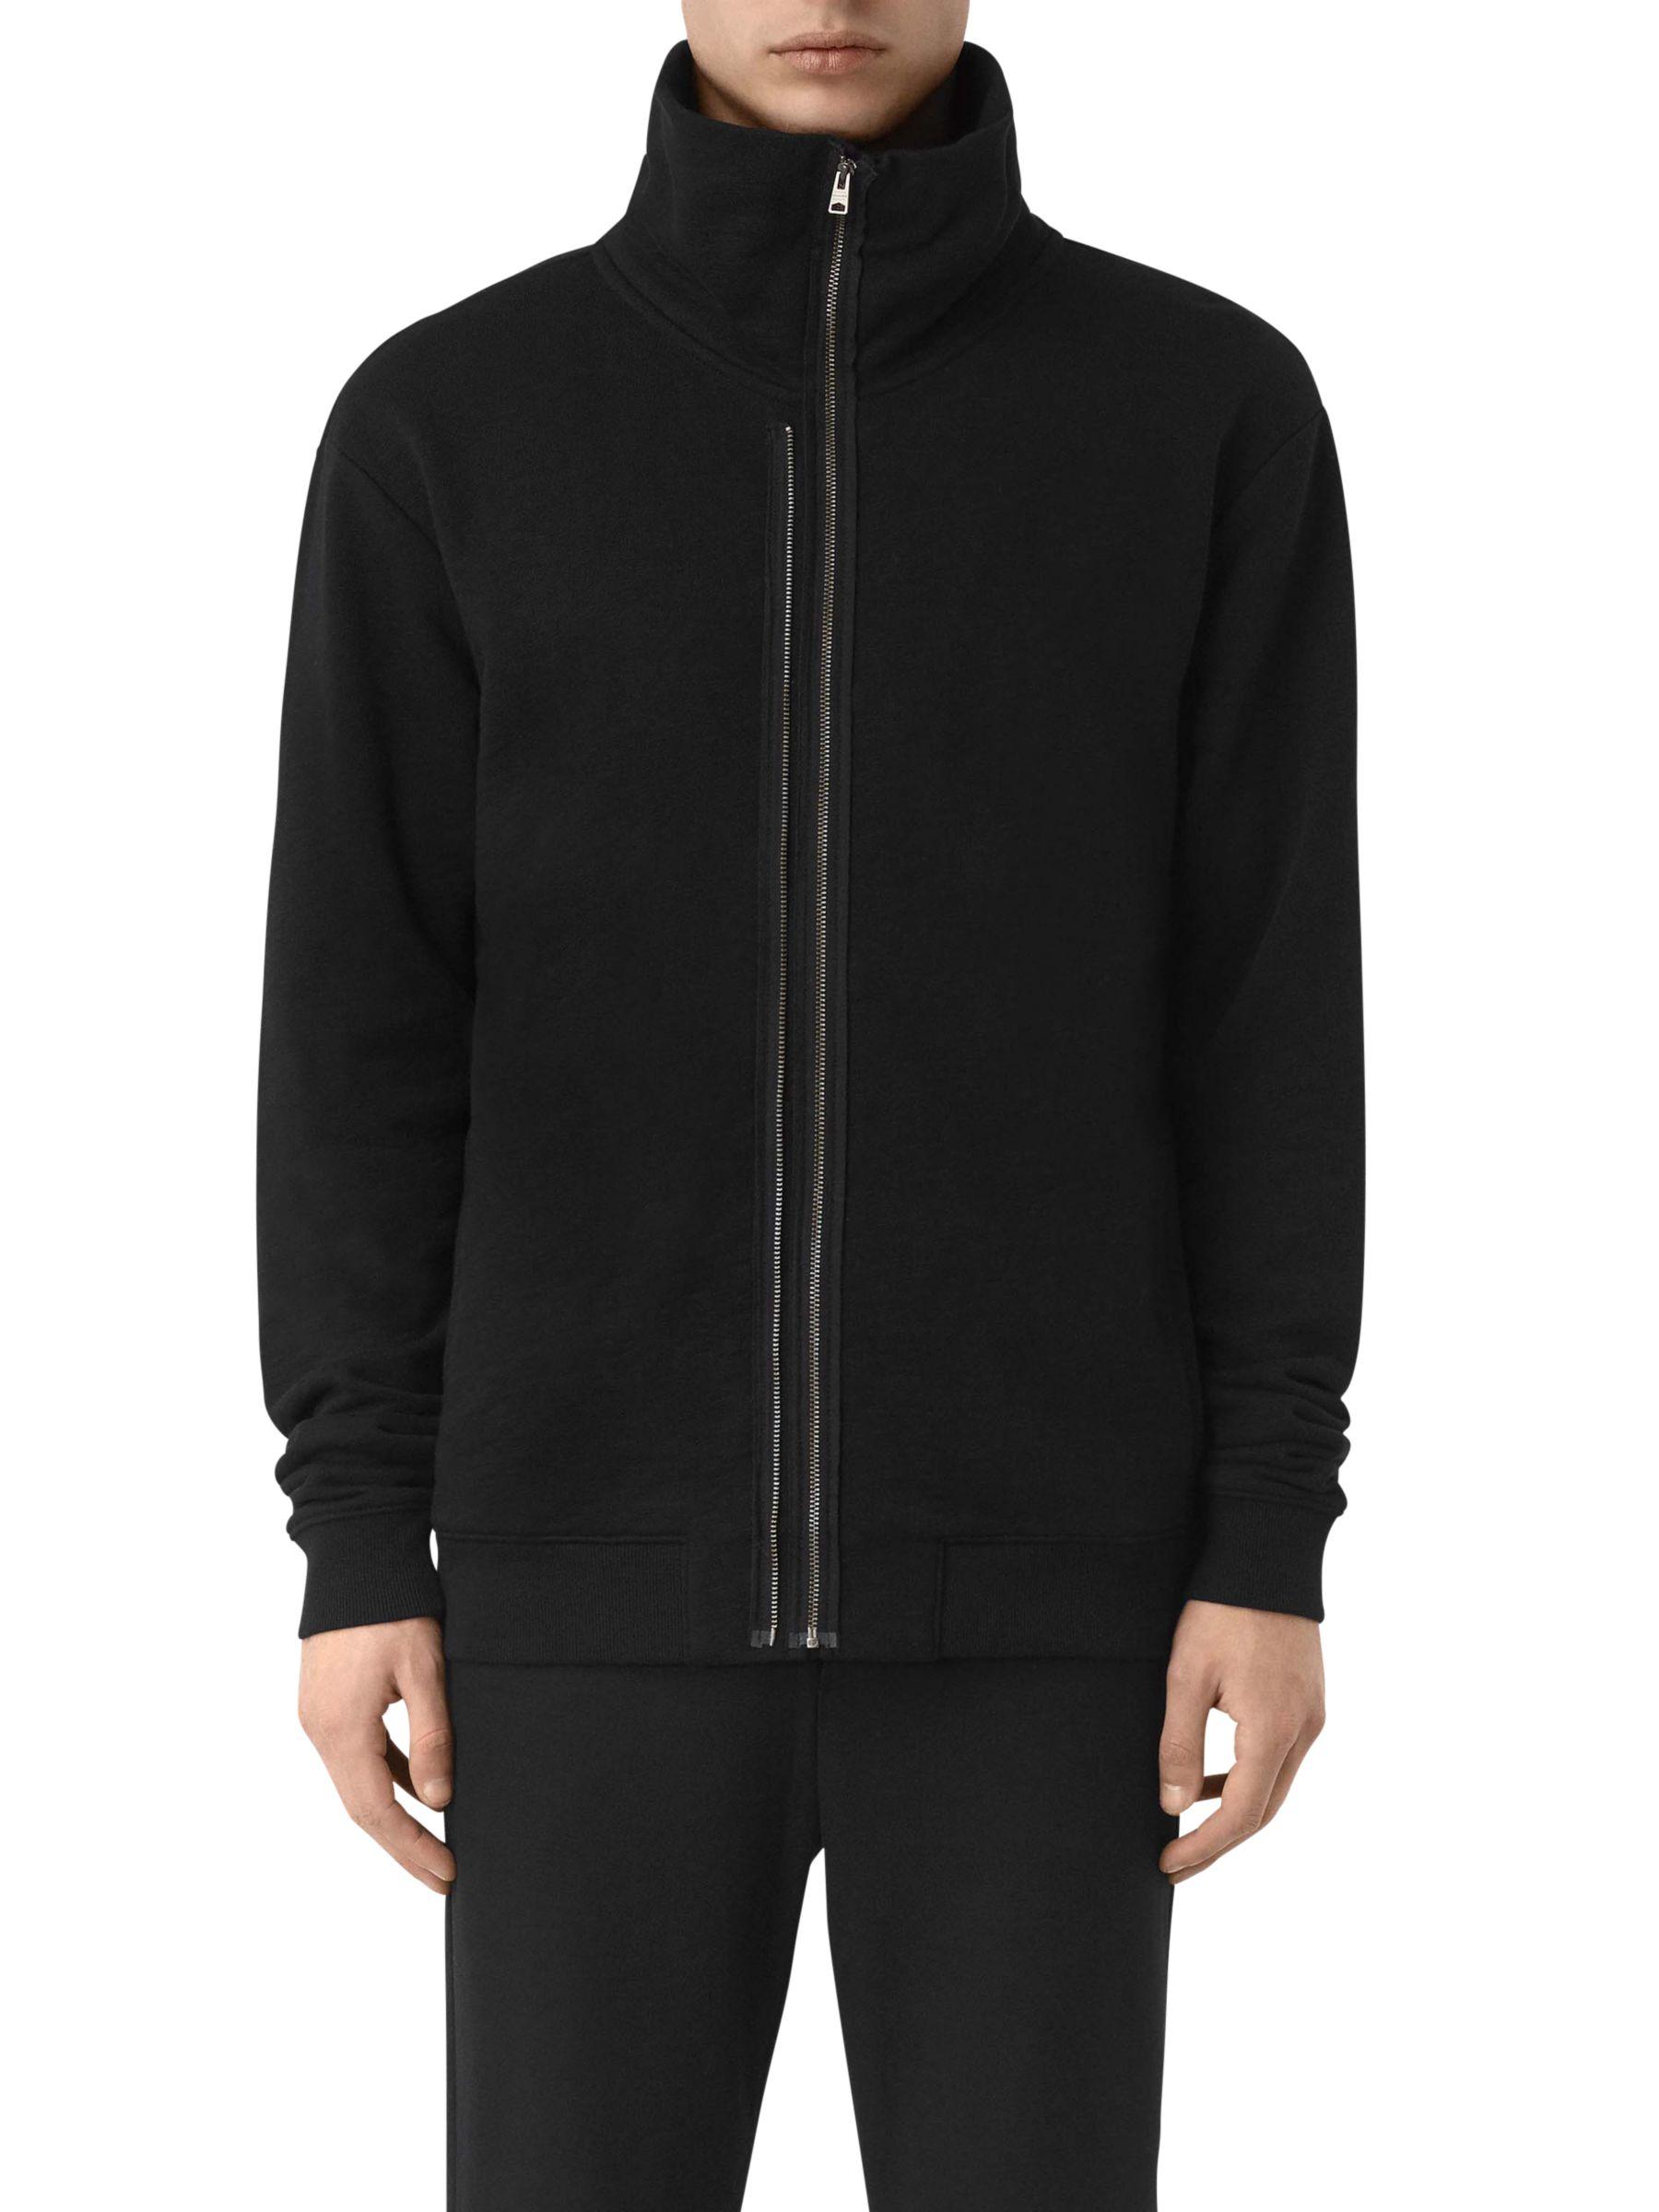 AllSaints AllSaints Double Funnel Neck Full Zip Sweatshirt, Jet Black